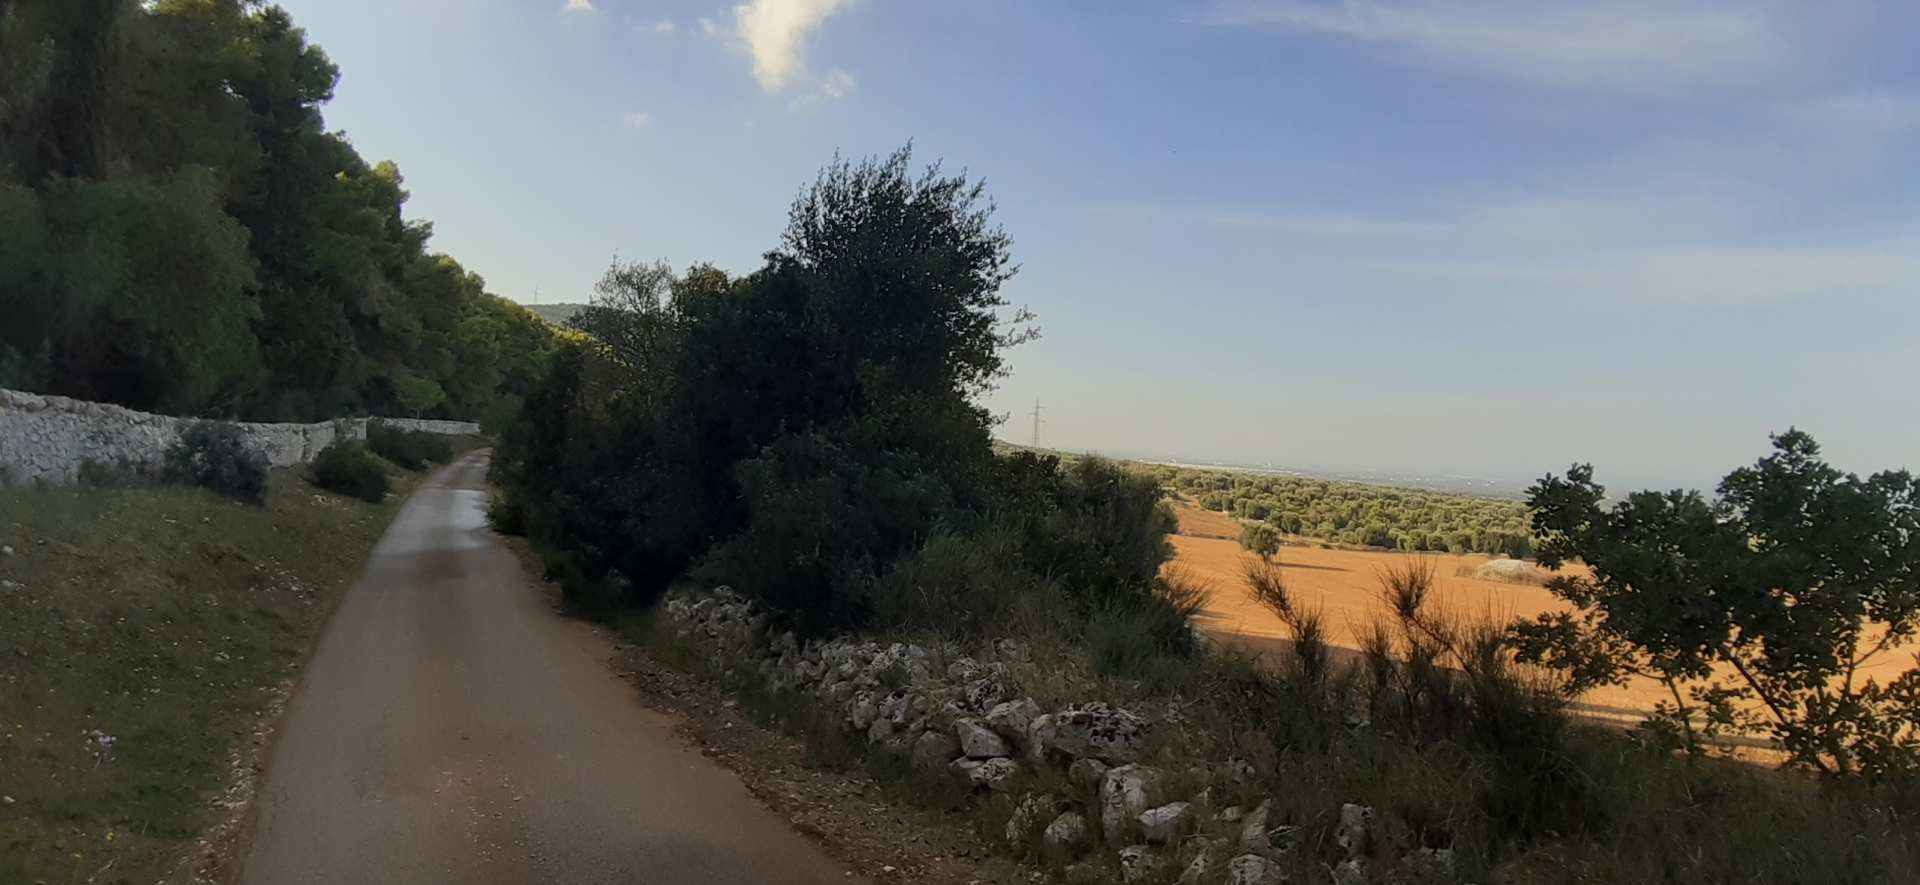 Monti Cisternino